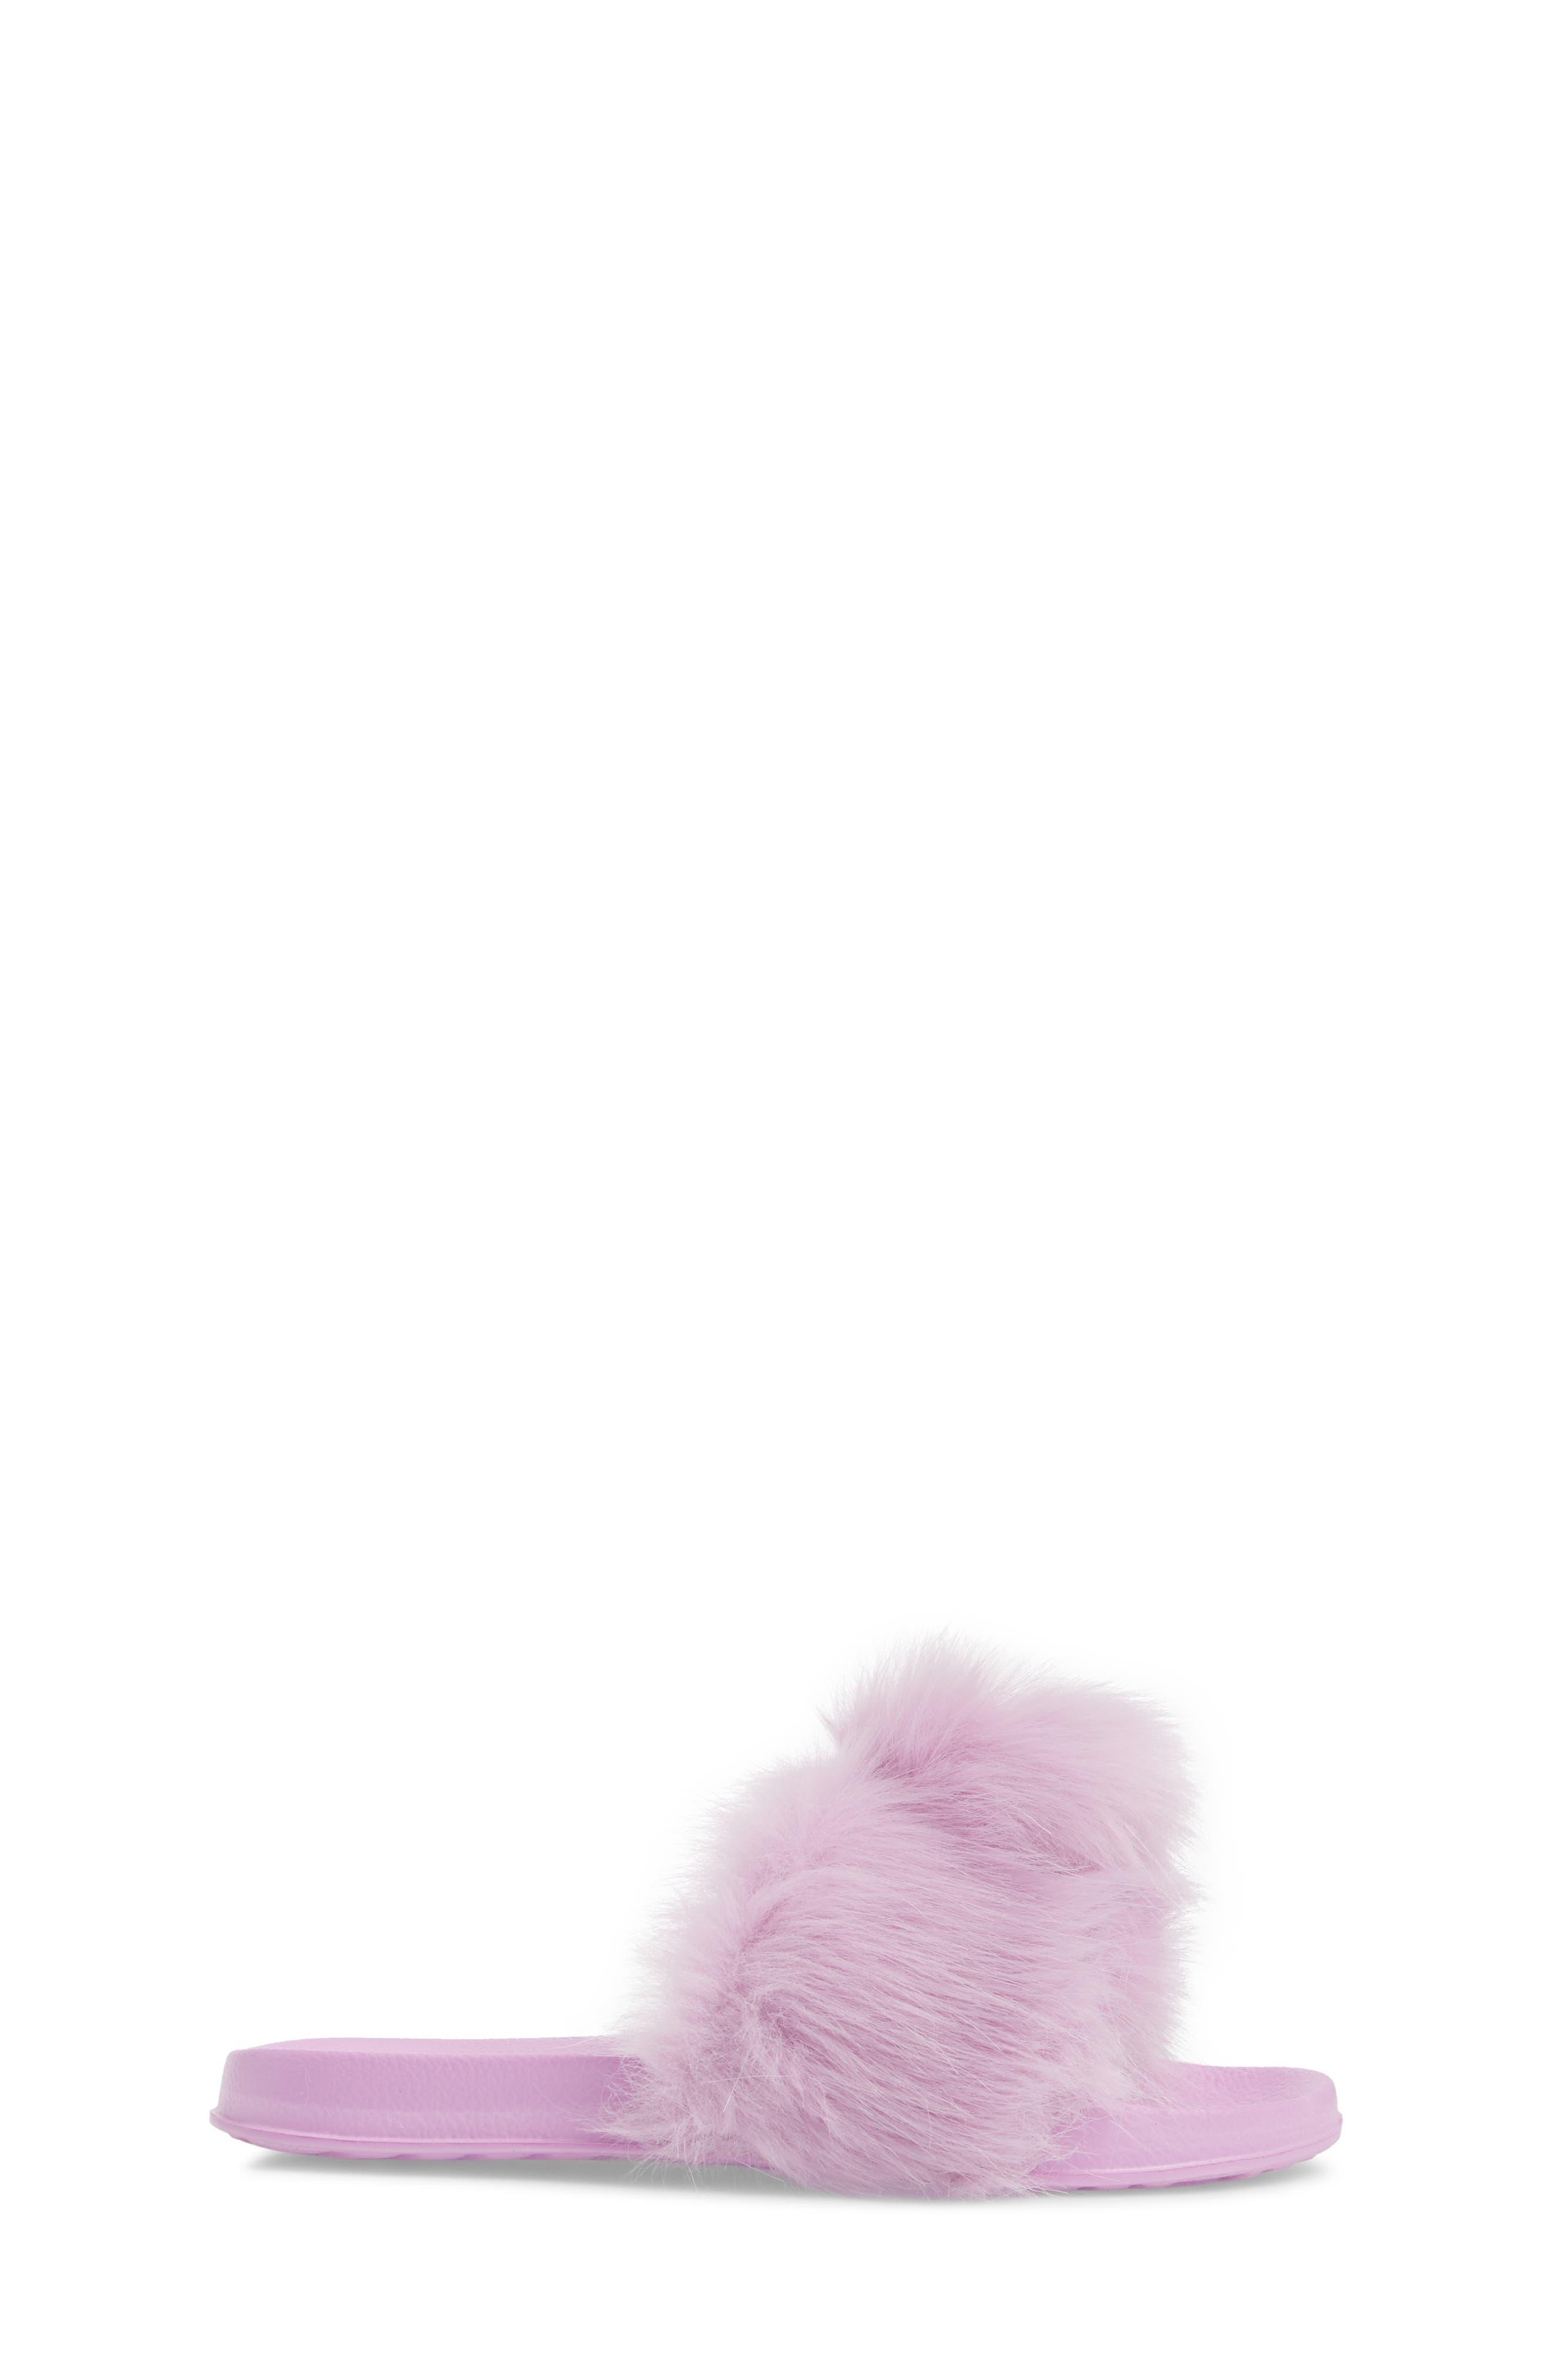 Mackie Aster Faux Fur Slide Sandal,                             Alternate thumbnail 3, color,                             510